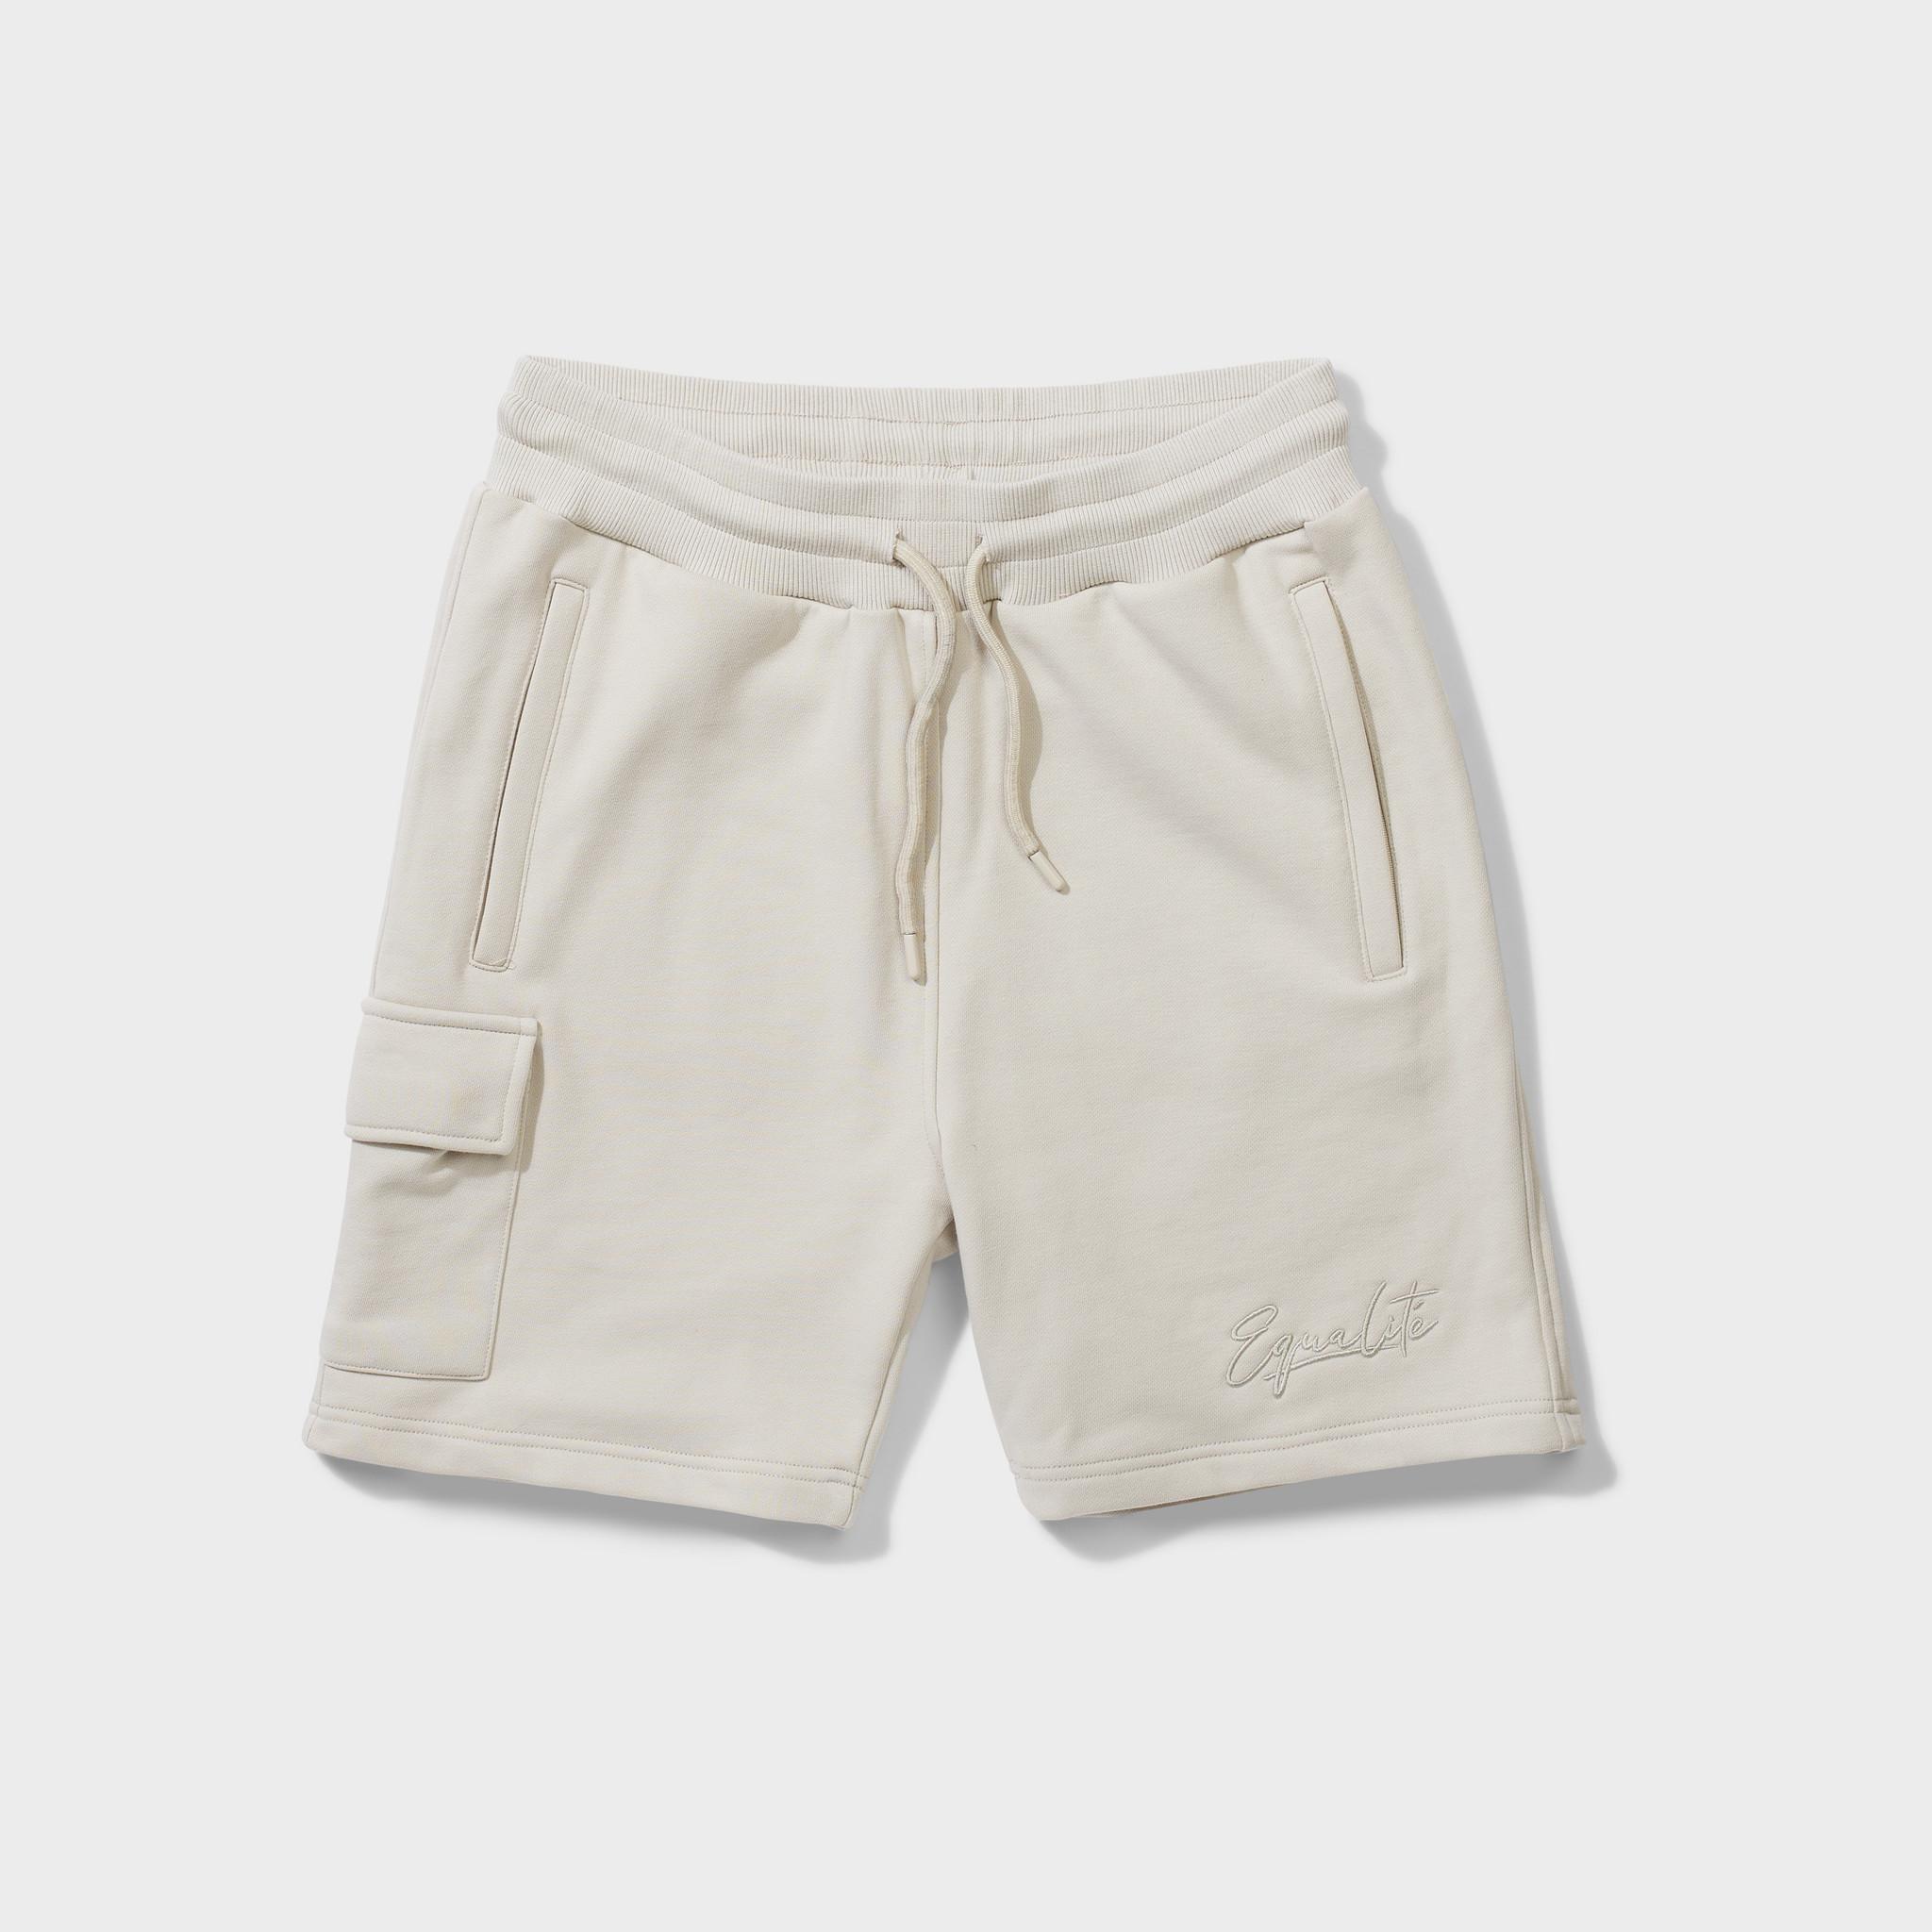 Wafi signature shorts beige-1